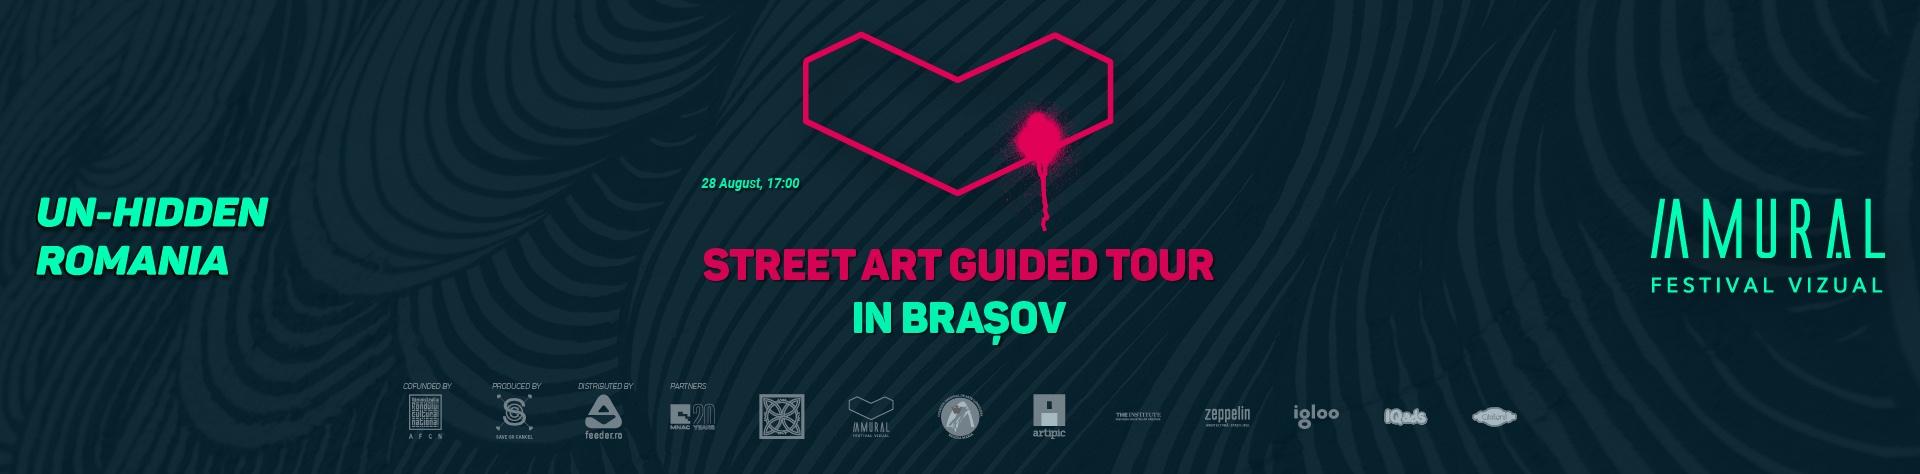 2021 Un-hidden Romania Amural Street art tour in Brasov